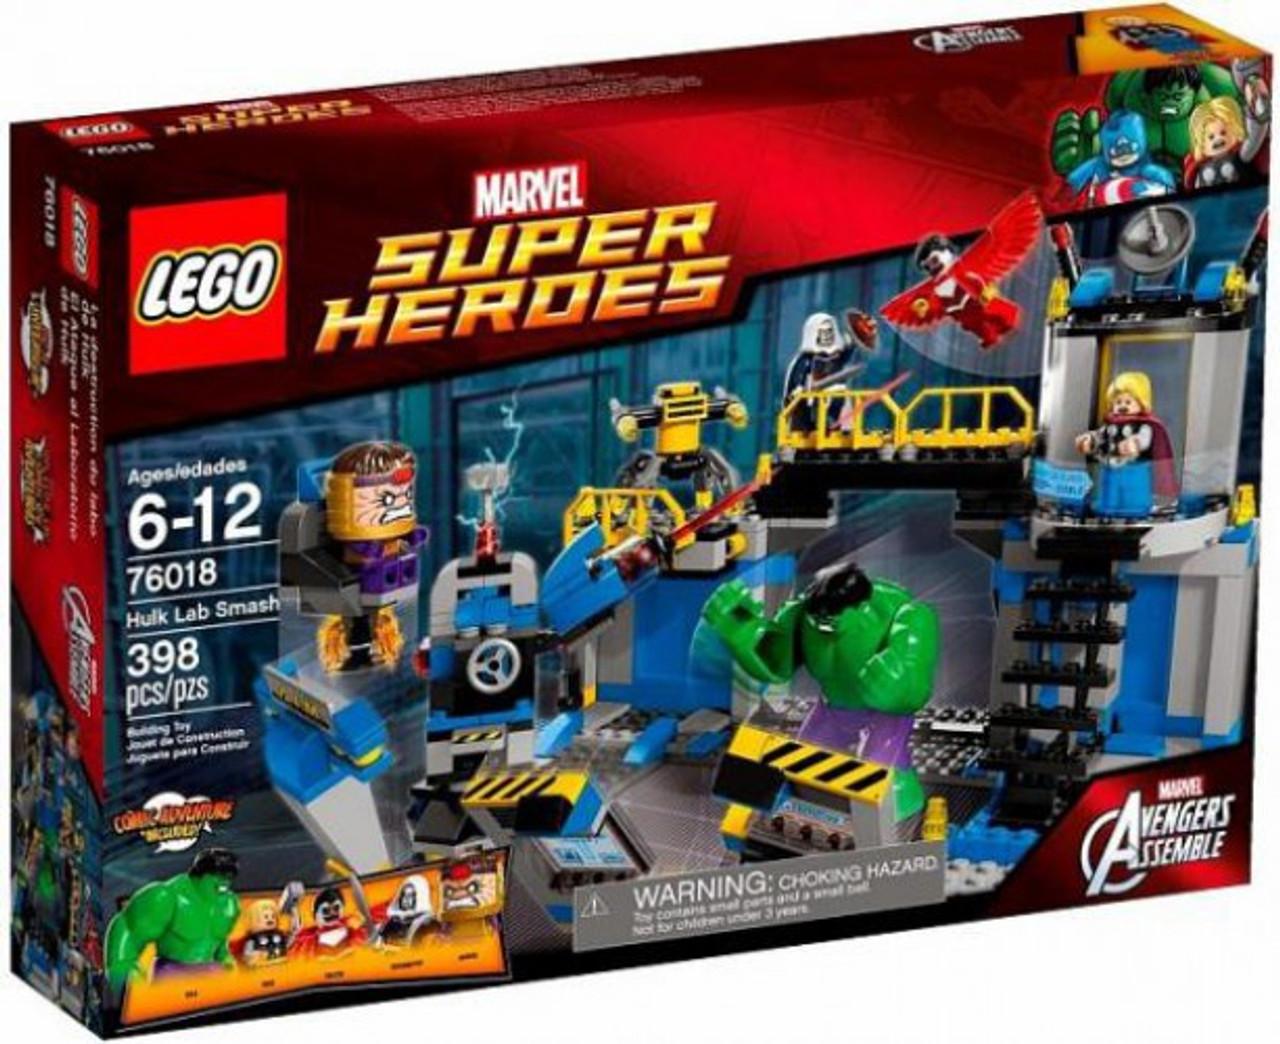 LEGO Marvel Super Heroes Avengers Assemble Hulk Lab Smash Set #76018